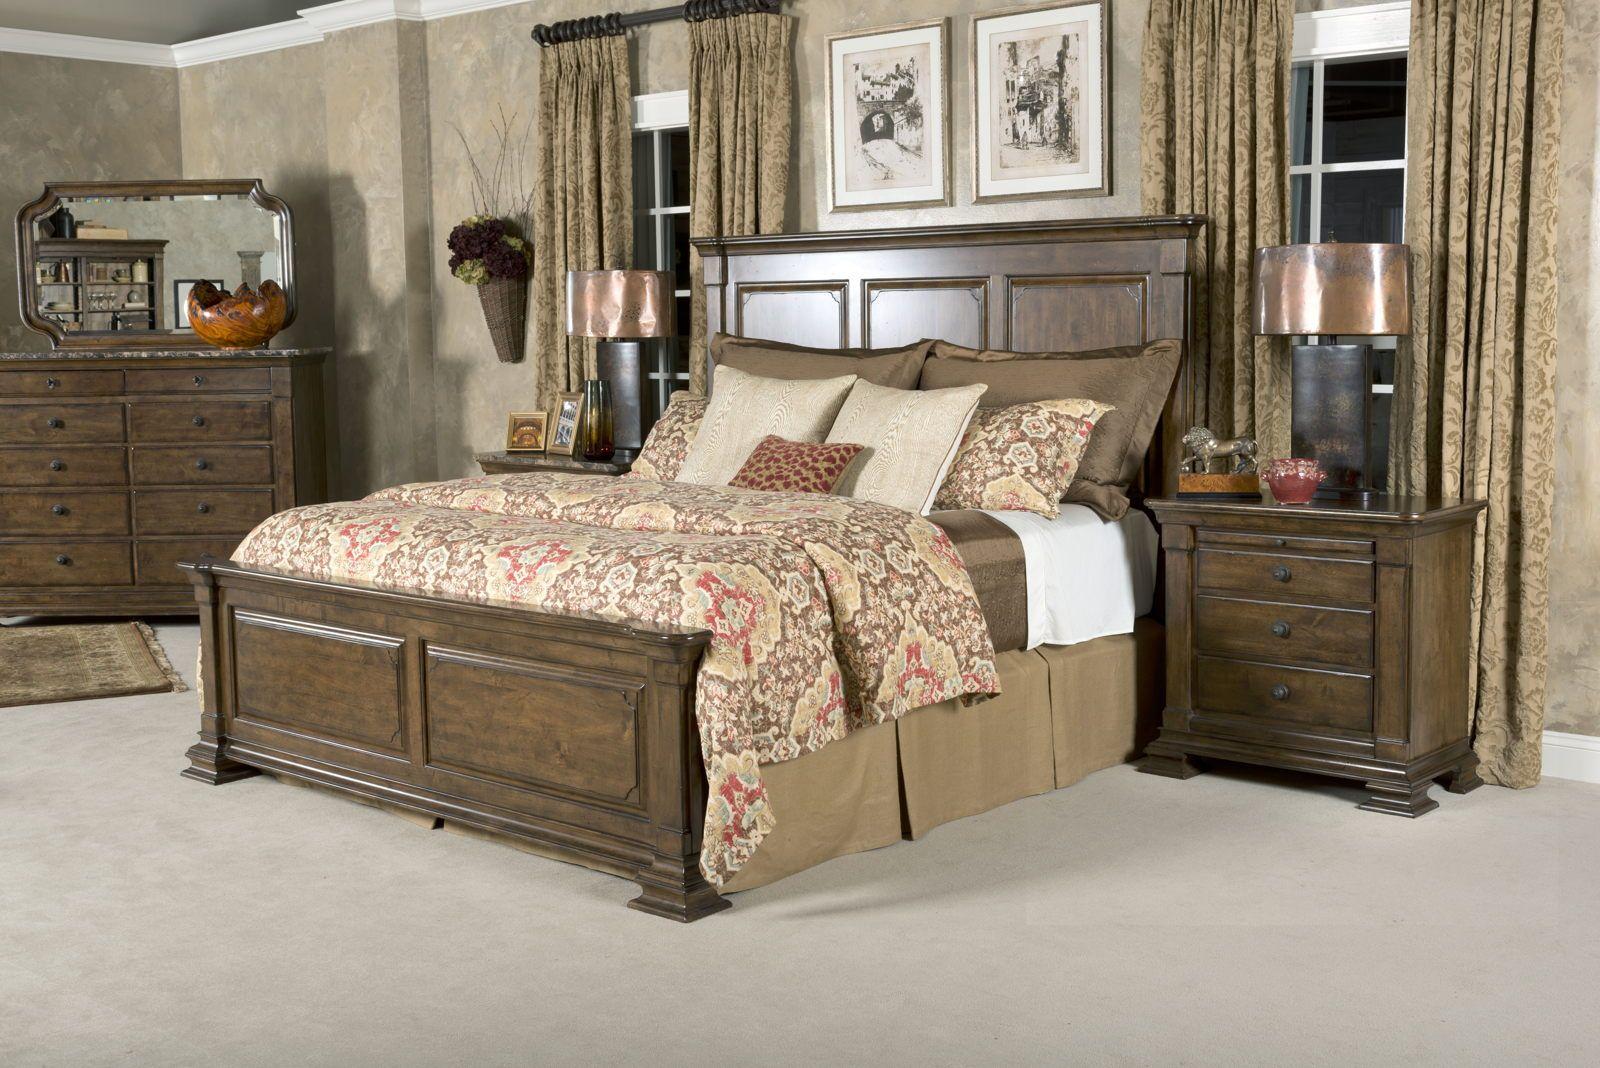 Kincaid Portolone Monteri Panel Bedroom Set In Rich Truffle Beds - Kincaid tuscano bedroom furniture